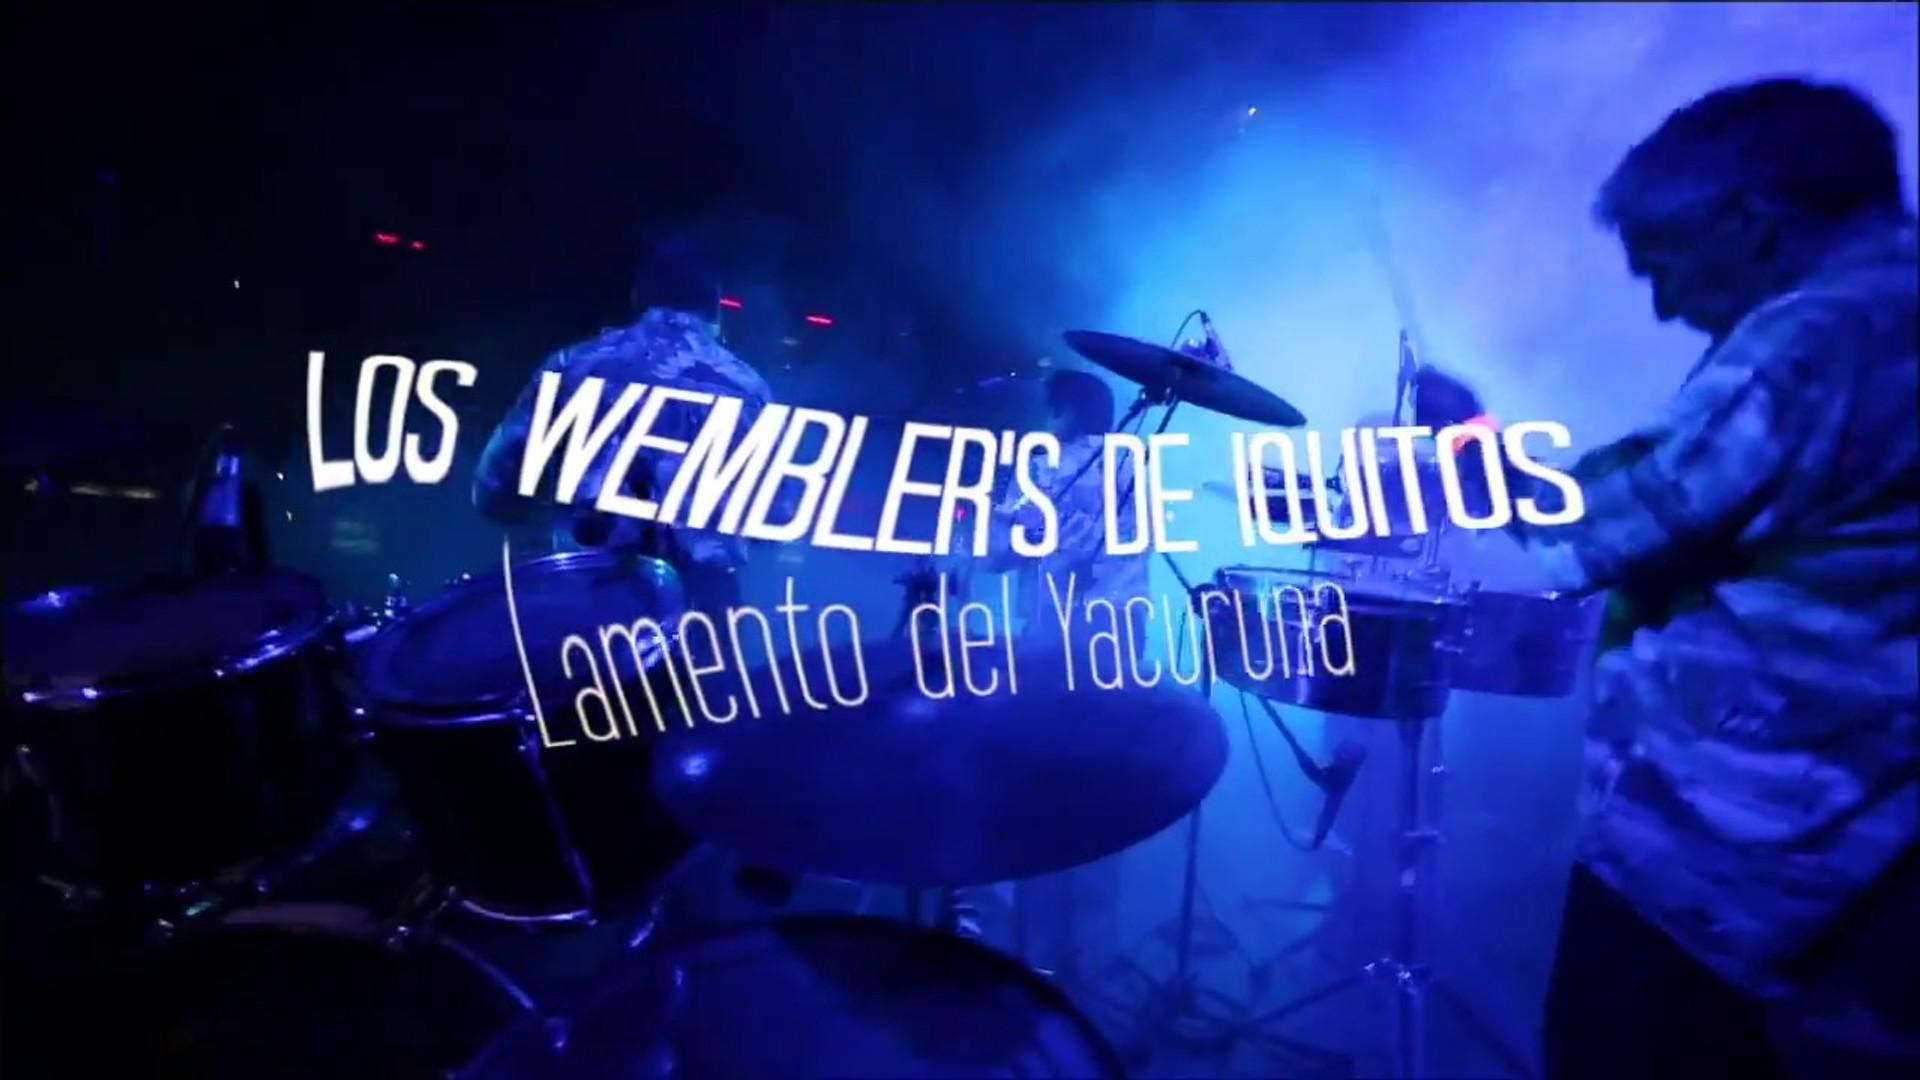 Los Wembler's de Iquitos